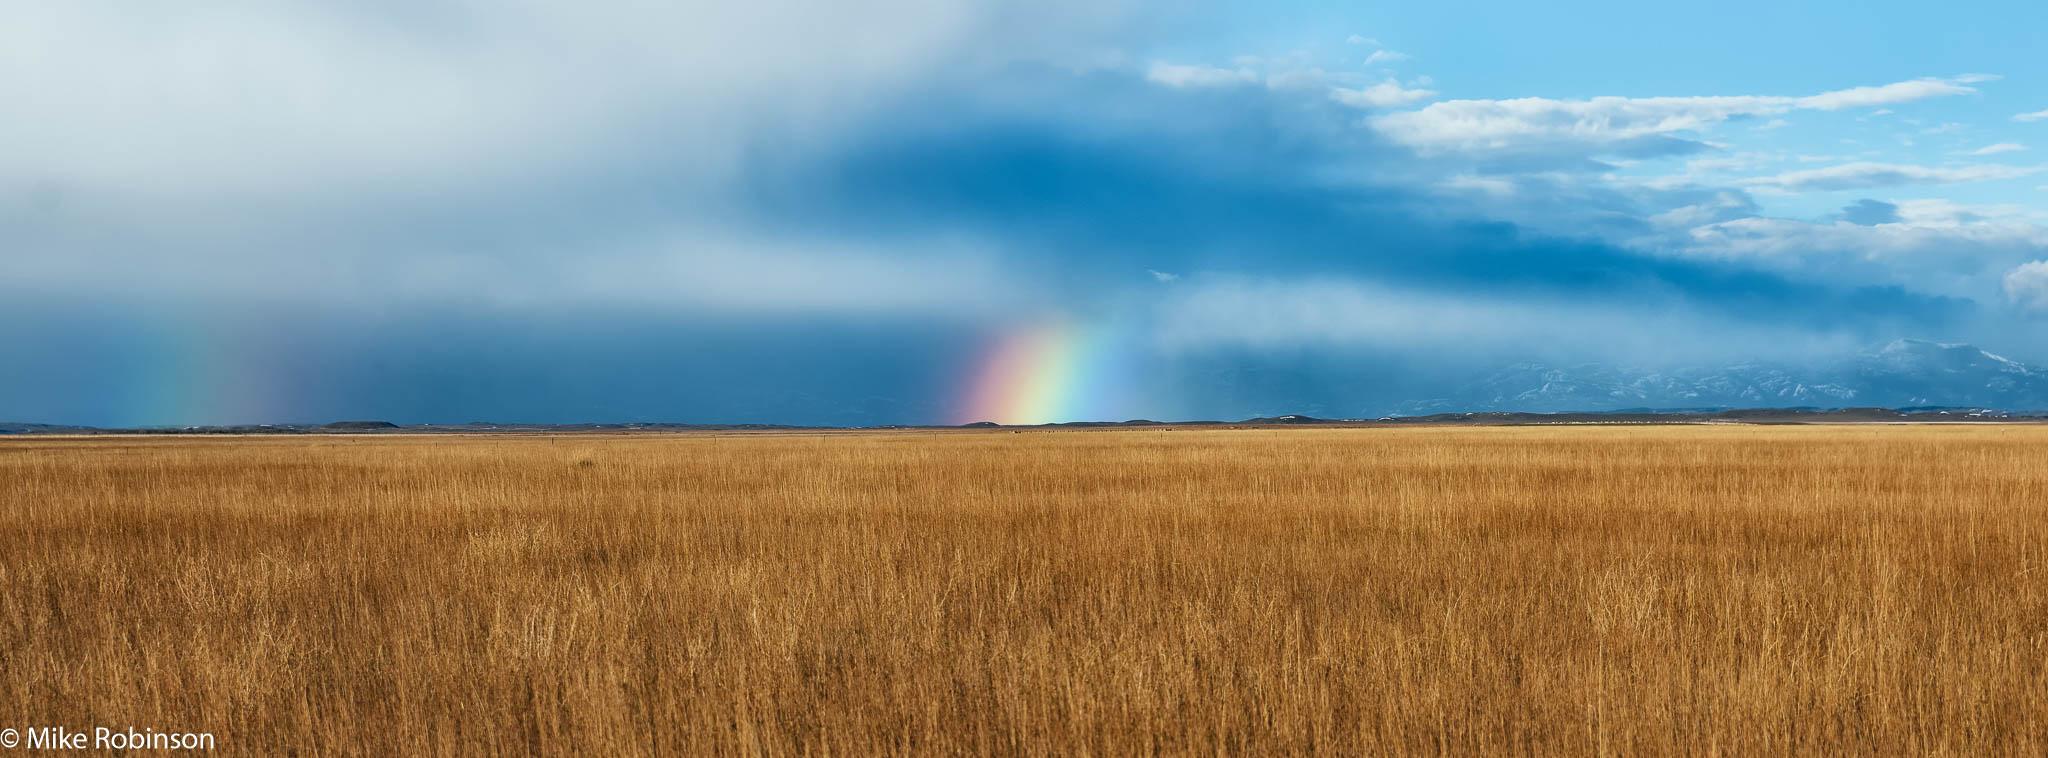 Rainbow Field.jpg